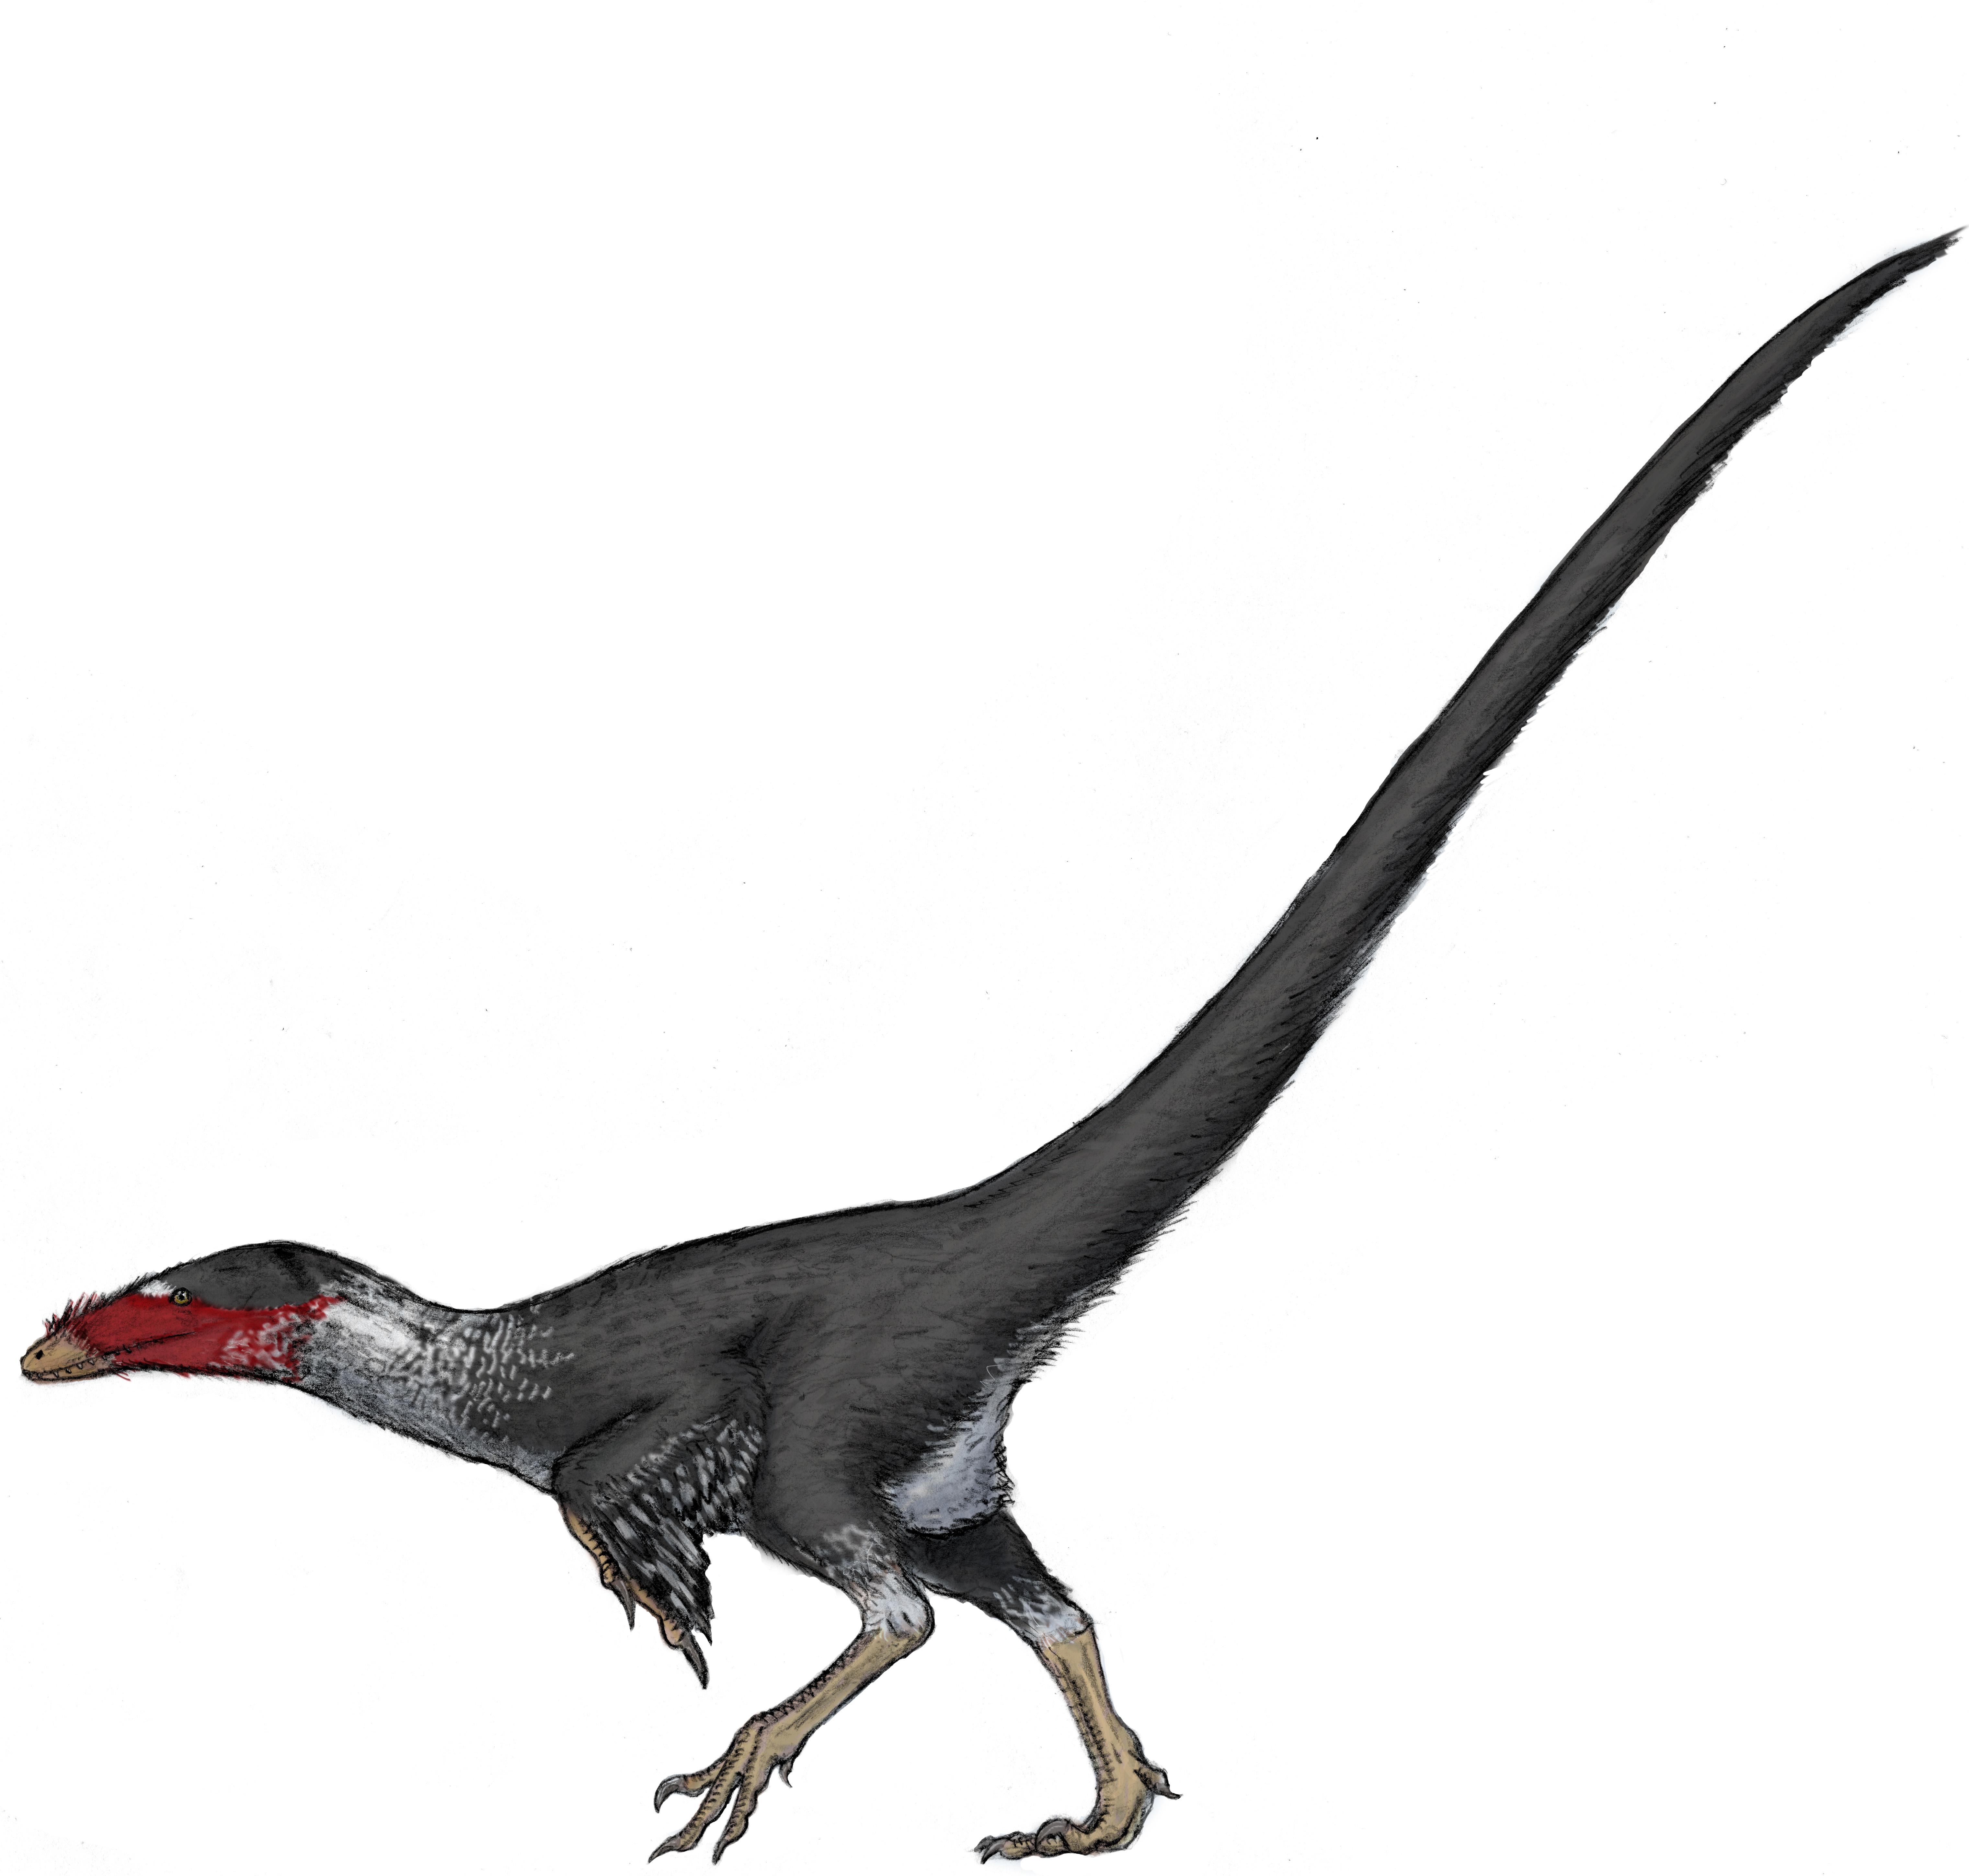 Asher Elbein alabama_dromaeosaurid-1 copy